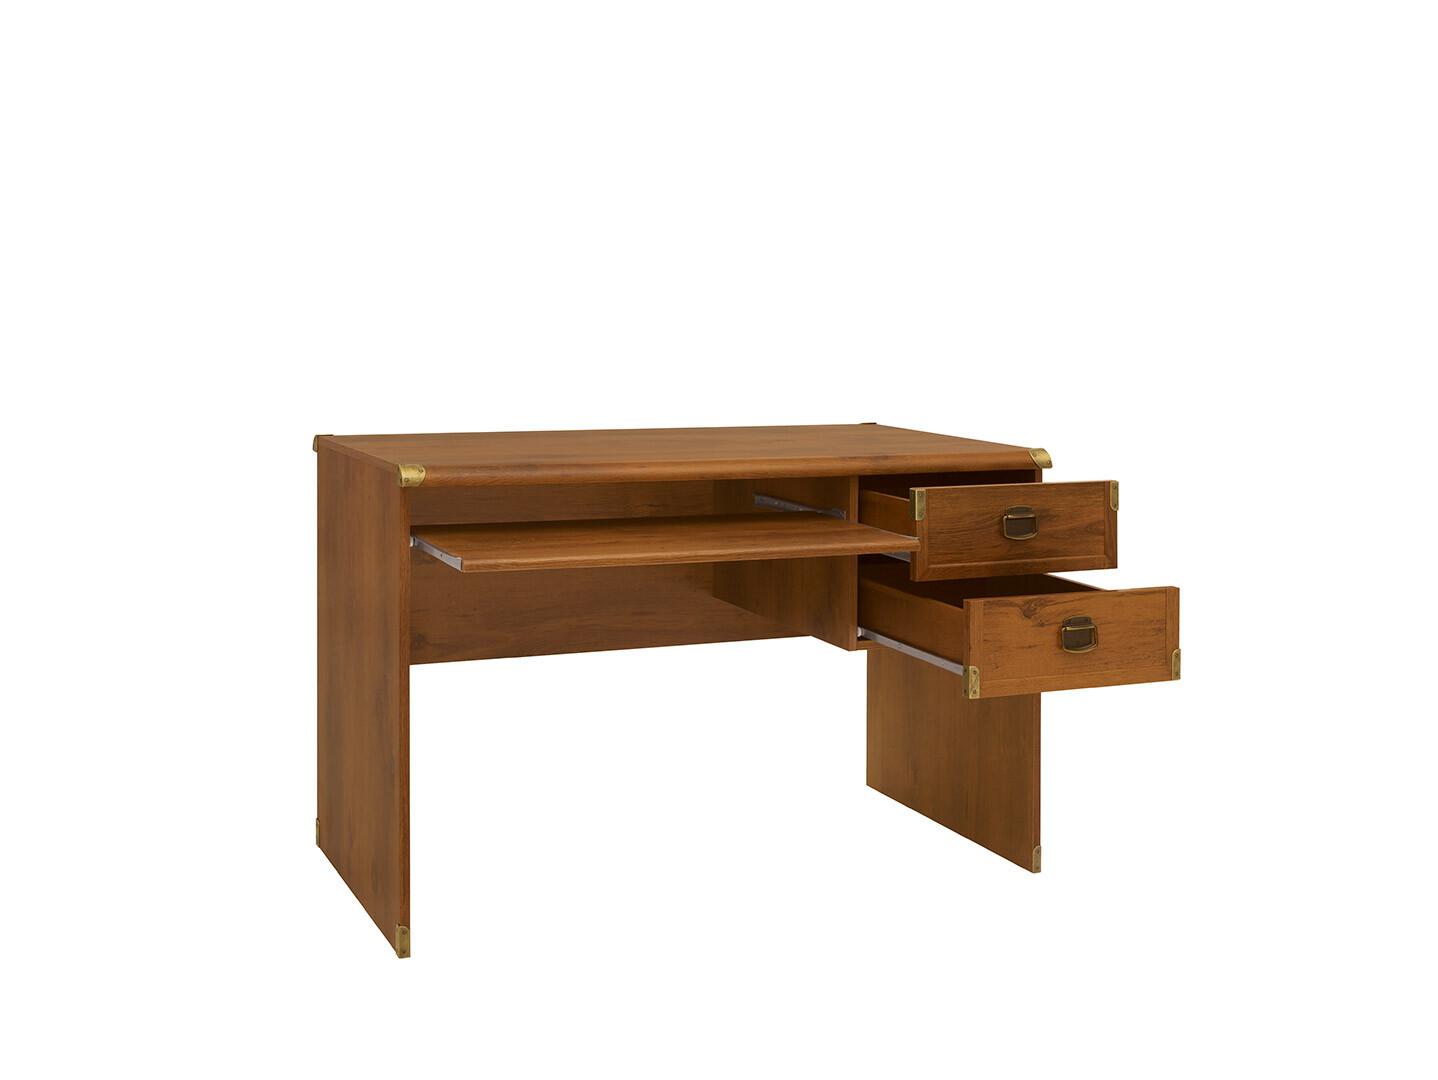 Kancelársky stôl INDIANA JBIU 2S dub sutter